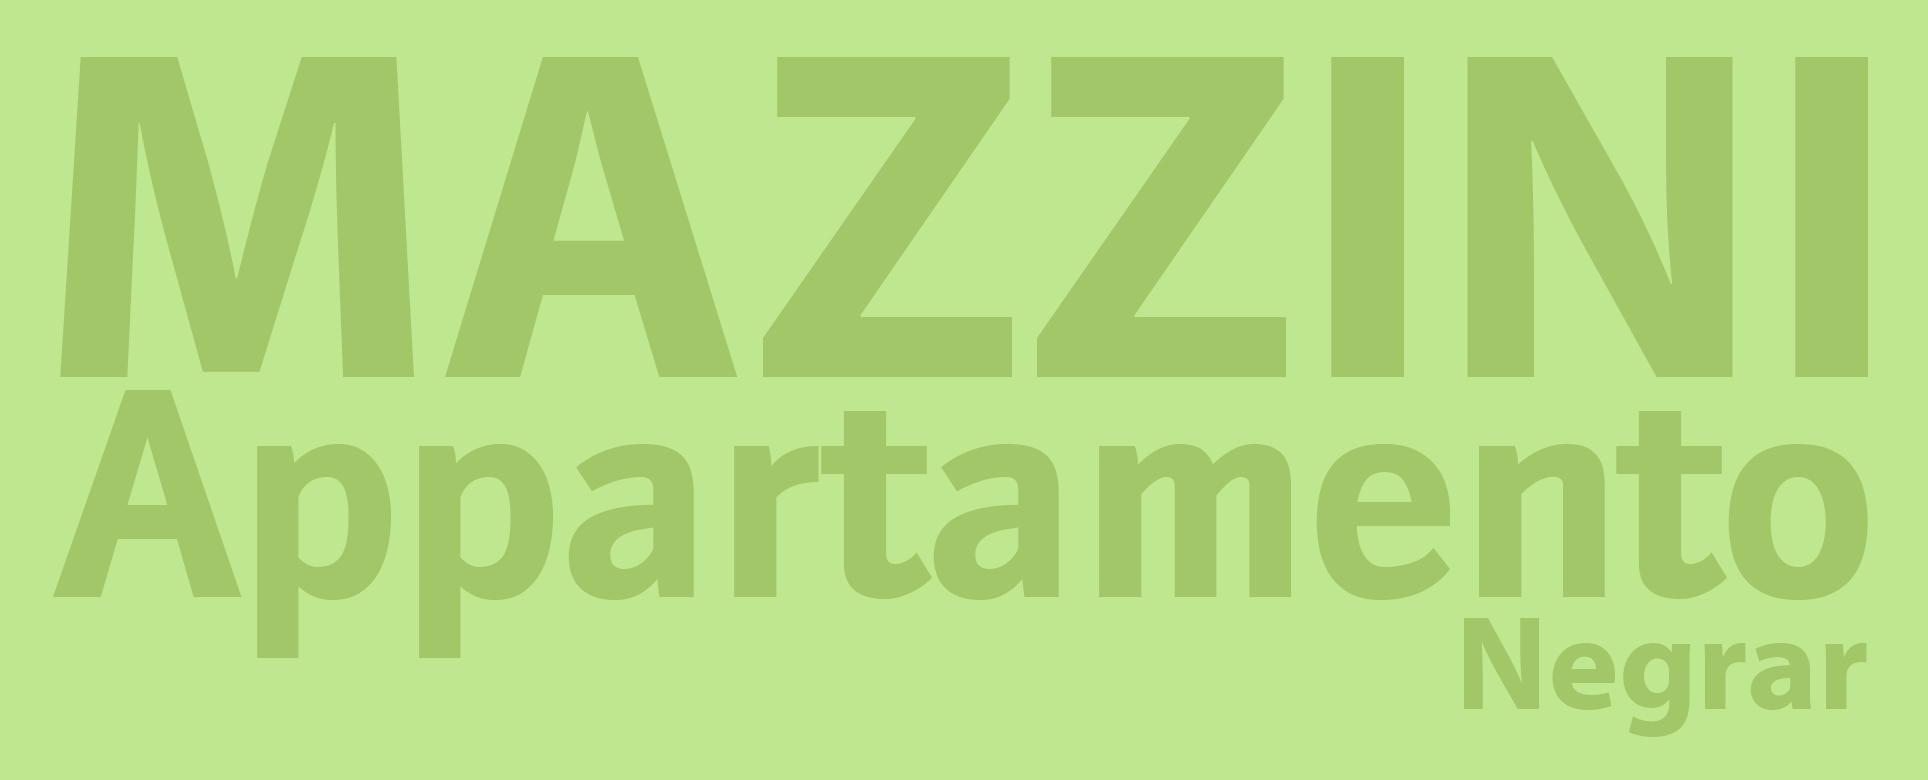 Appartamento Mazzini Negrar Logo